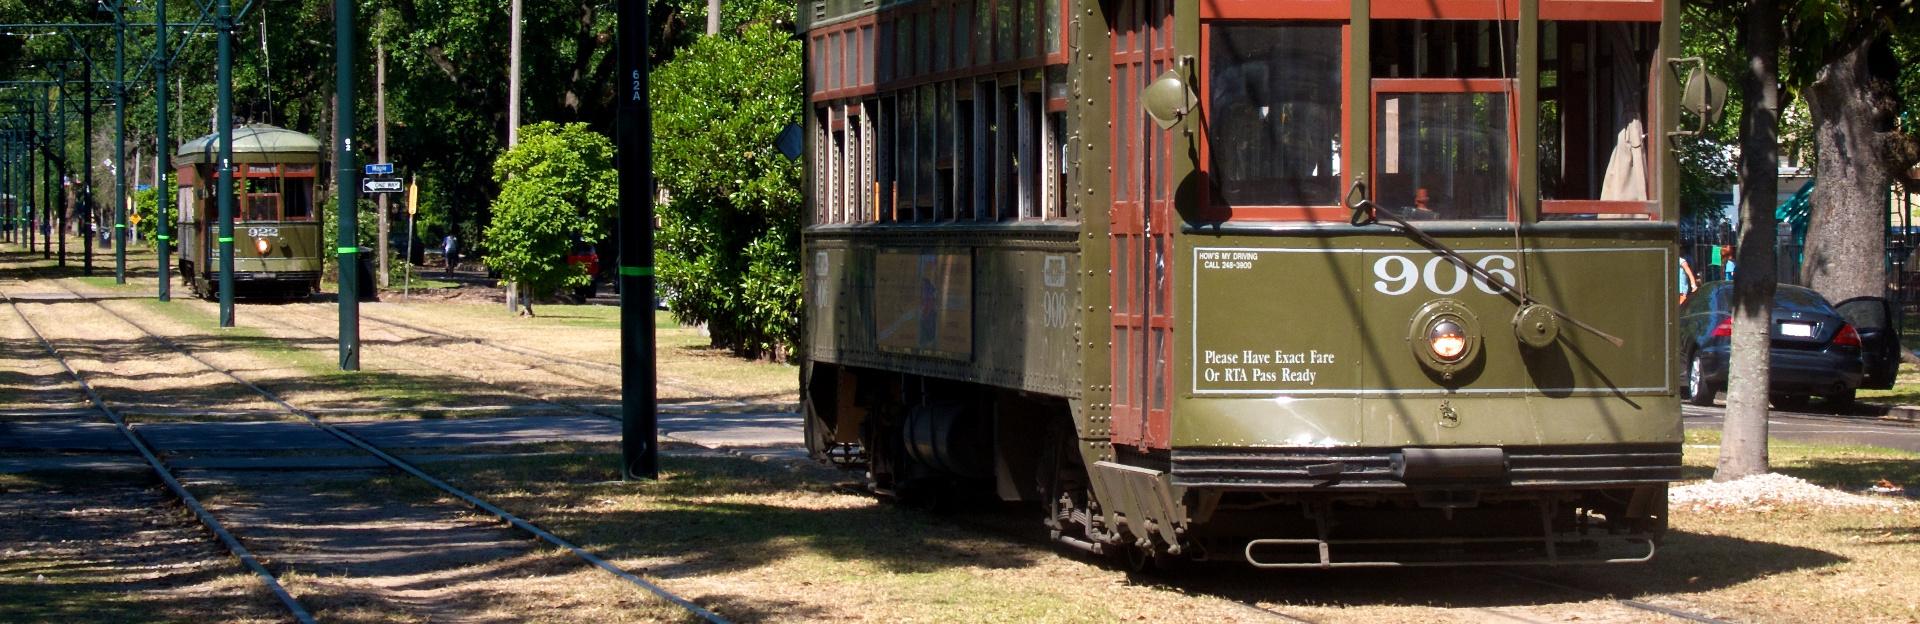 New orleans streetcar tour